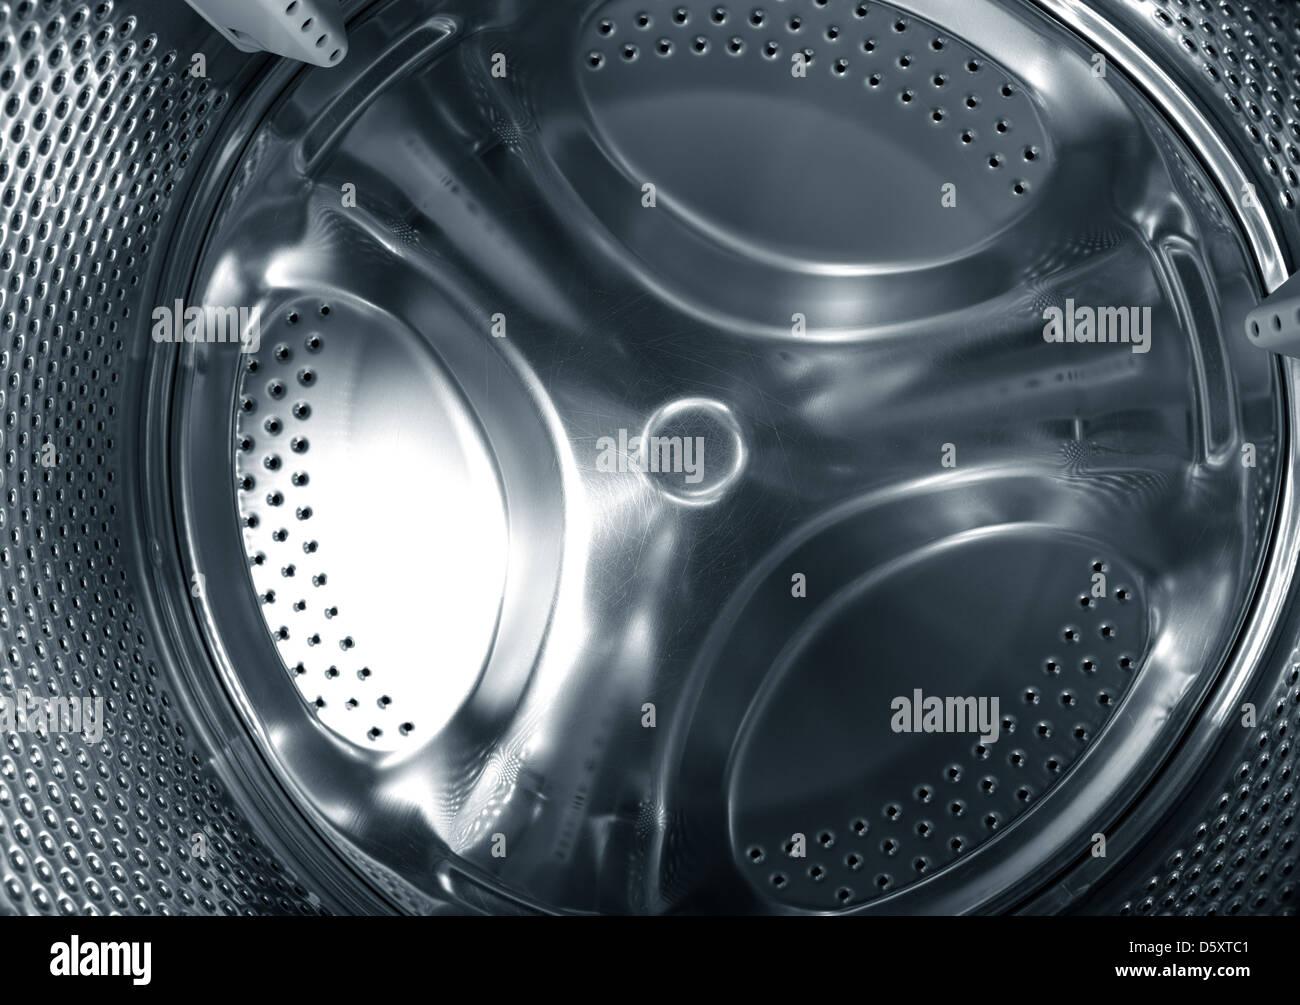 Spaceship element - Stock Image